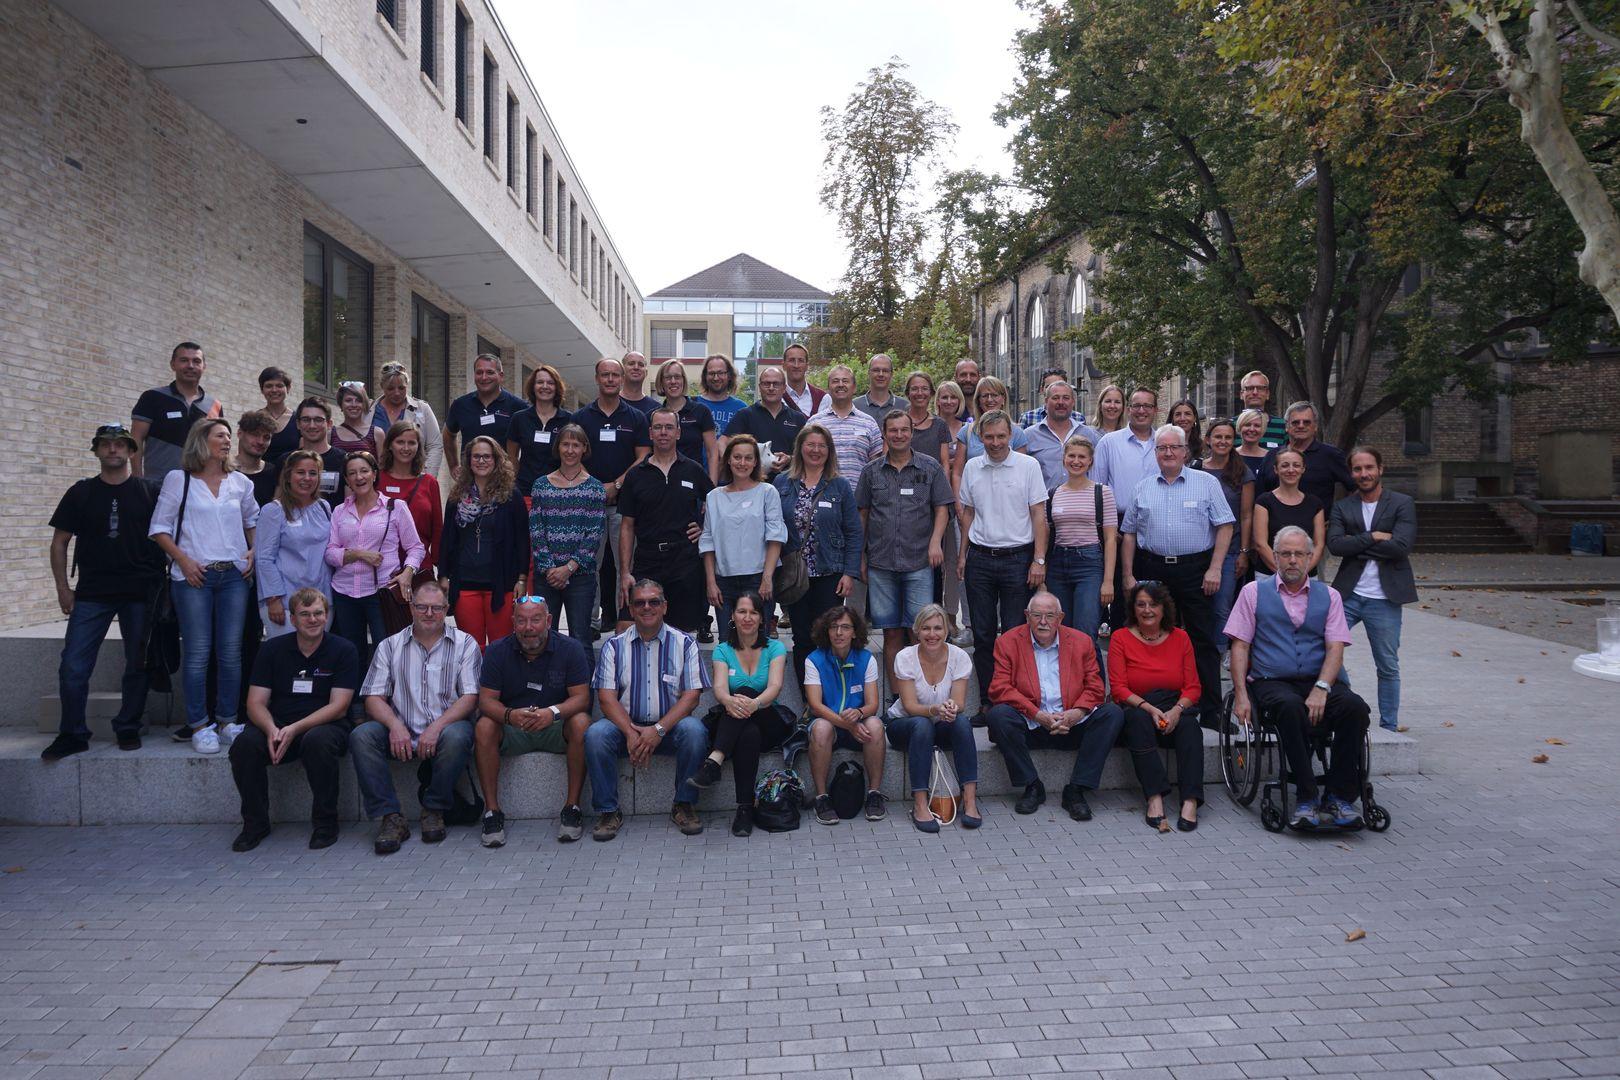 2018-09-15_028_Alumnitreffen.JPG.jpg